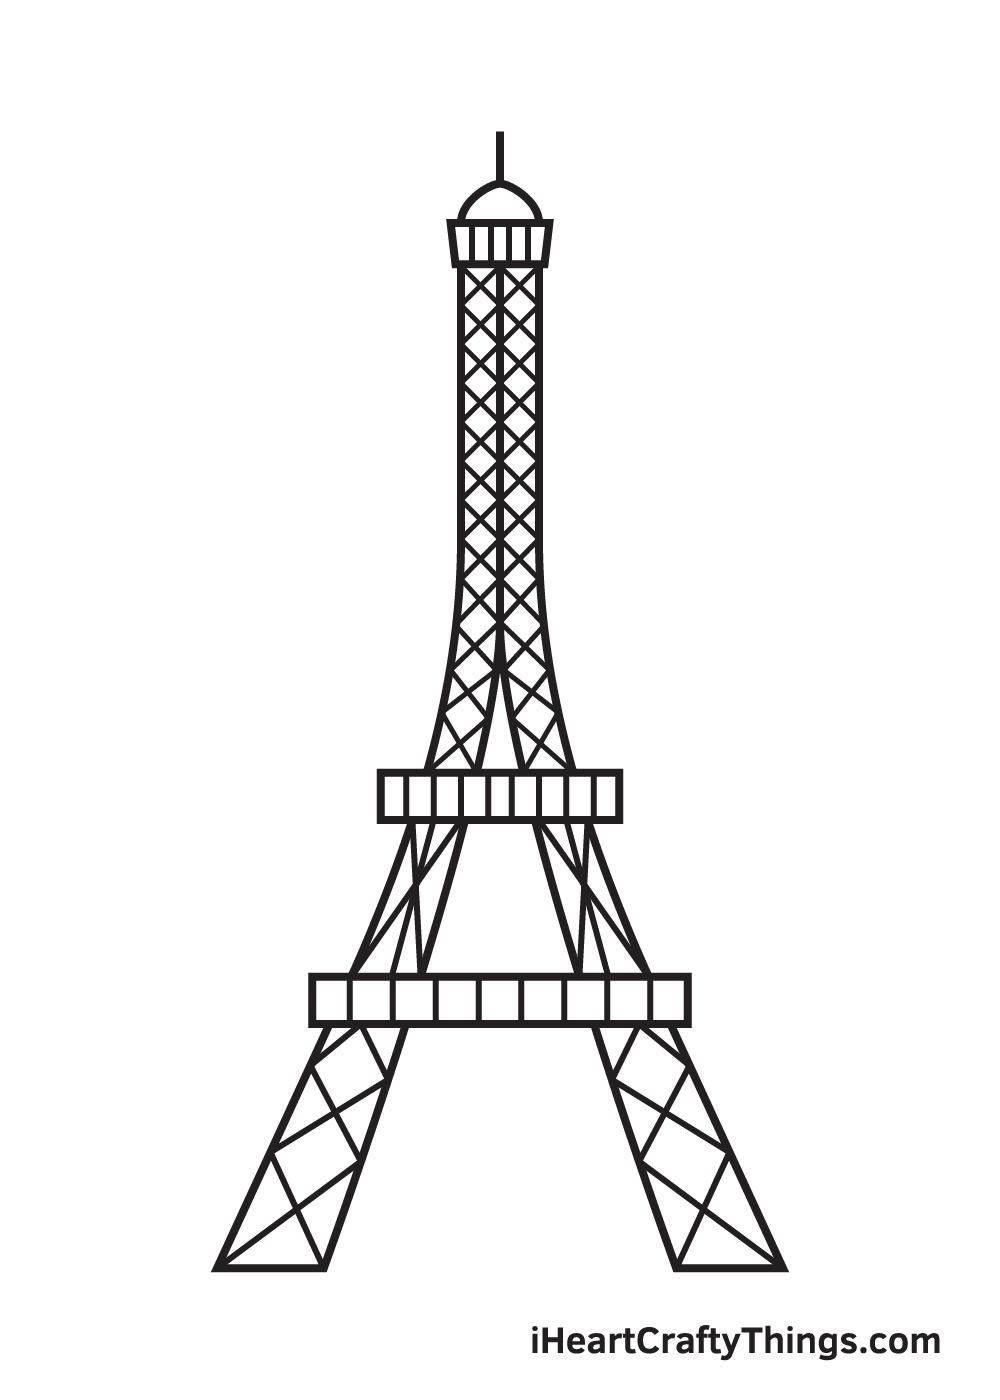 Eiffel Tower drawing - step 9